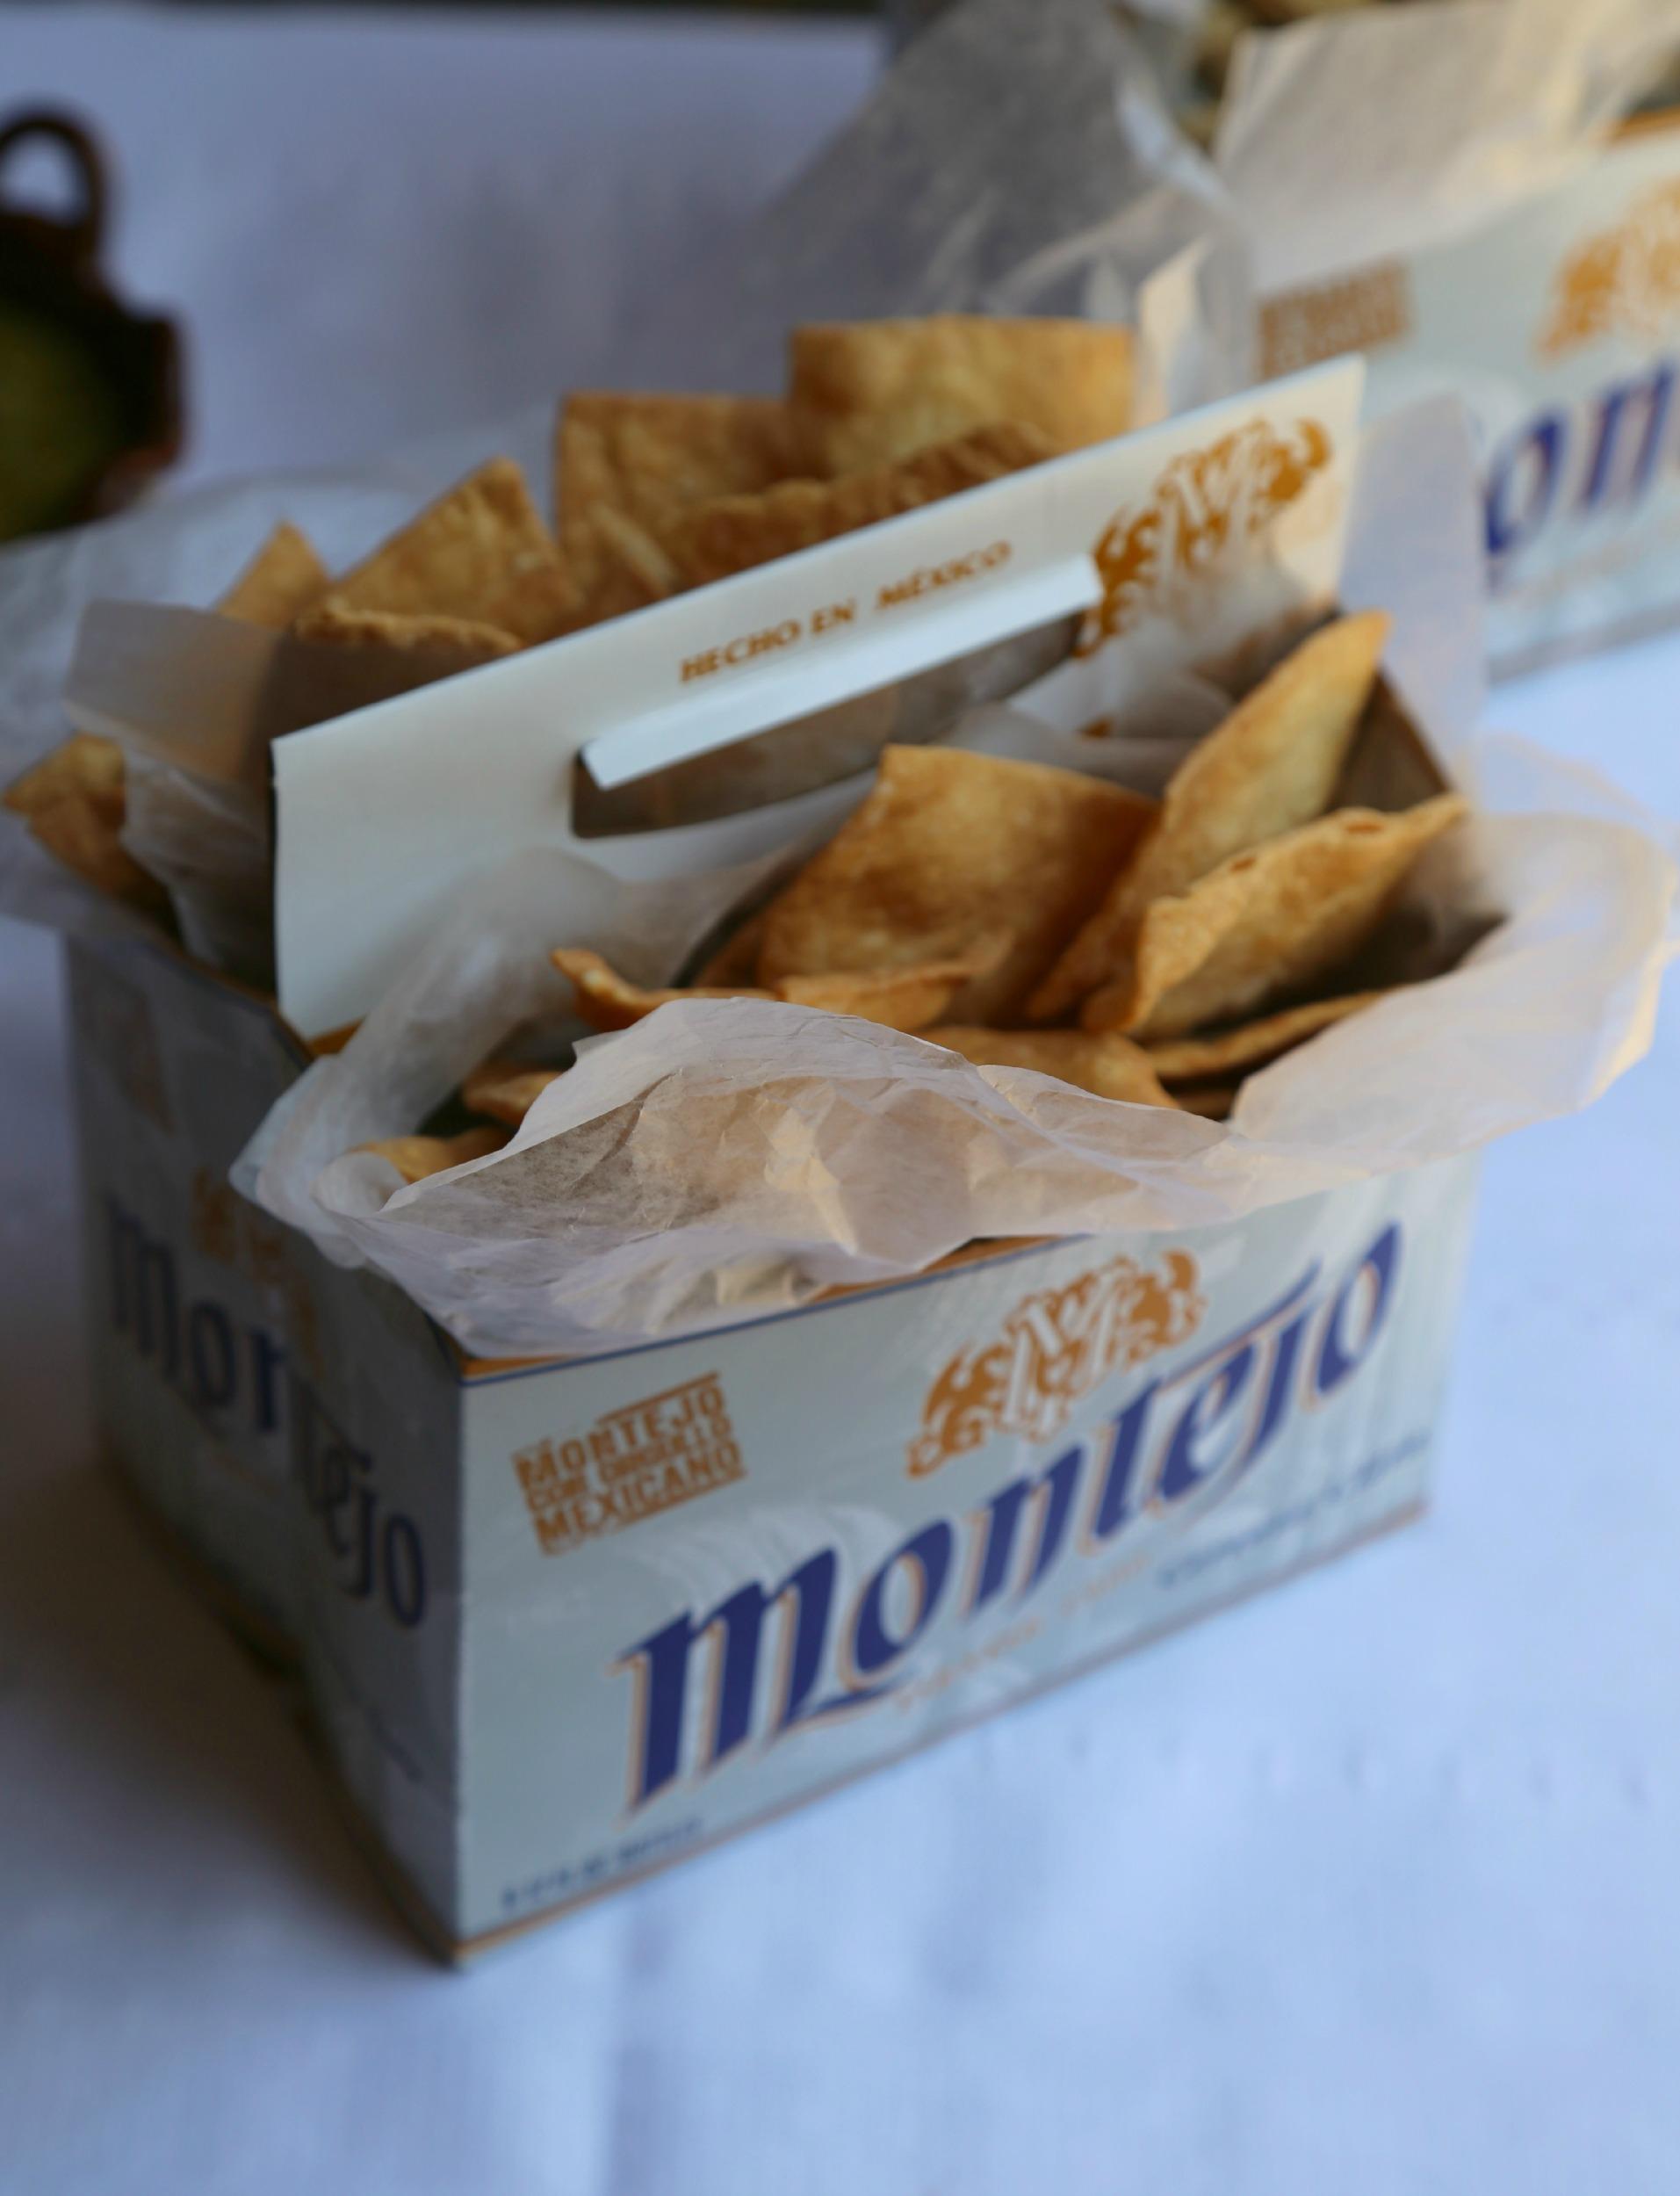 montejo-cerveza-snack-party-VianneyRodriguez-sweetlifebake-beercocktail